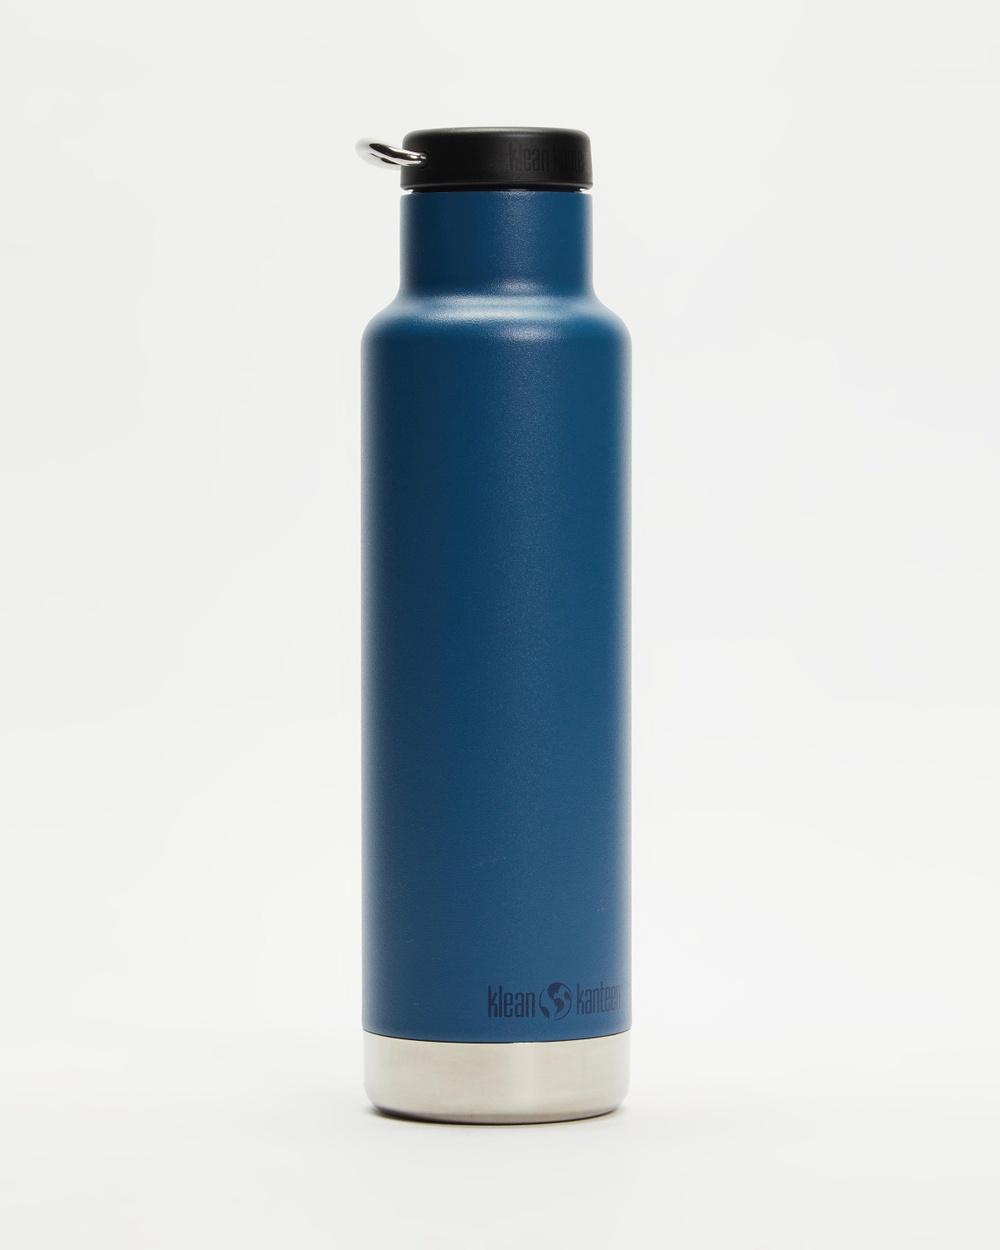 Klean Kanteen 20oz Insulated Classic Loop Cap Bottle Water Bottles Real Teal